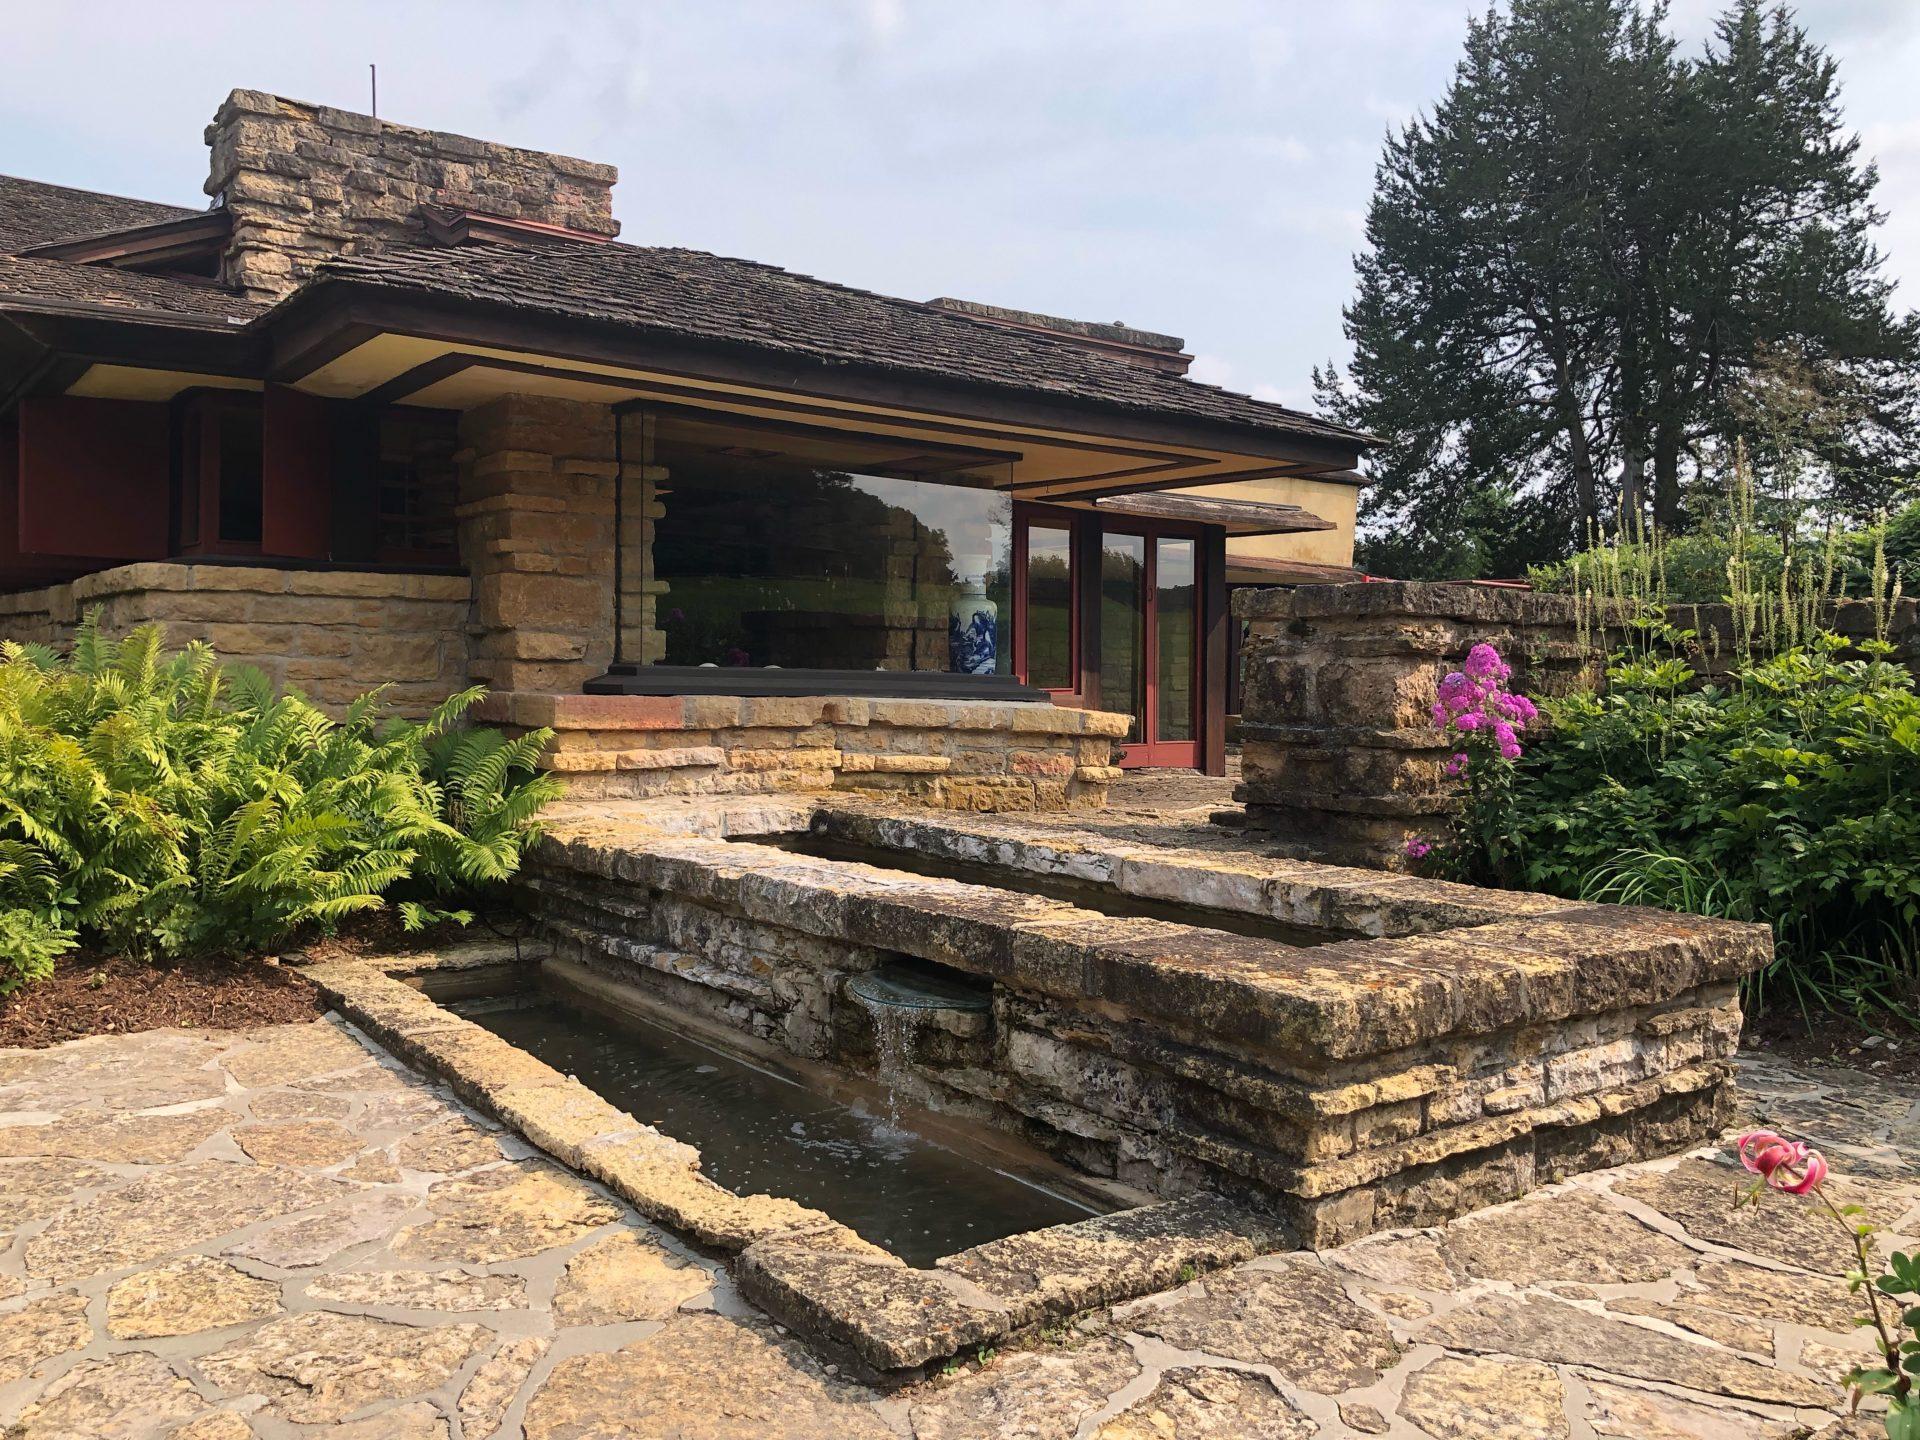 Frank Lloyd Wright's Taliesin home in Wisconsin.